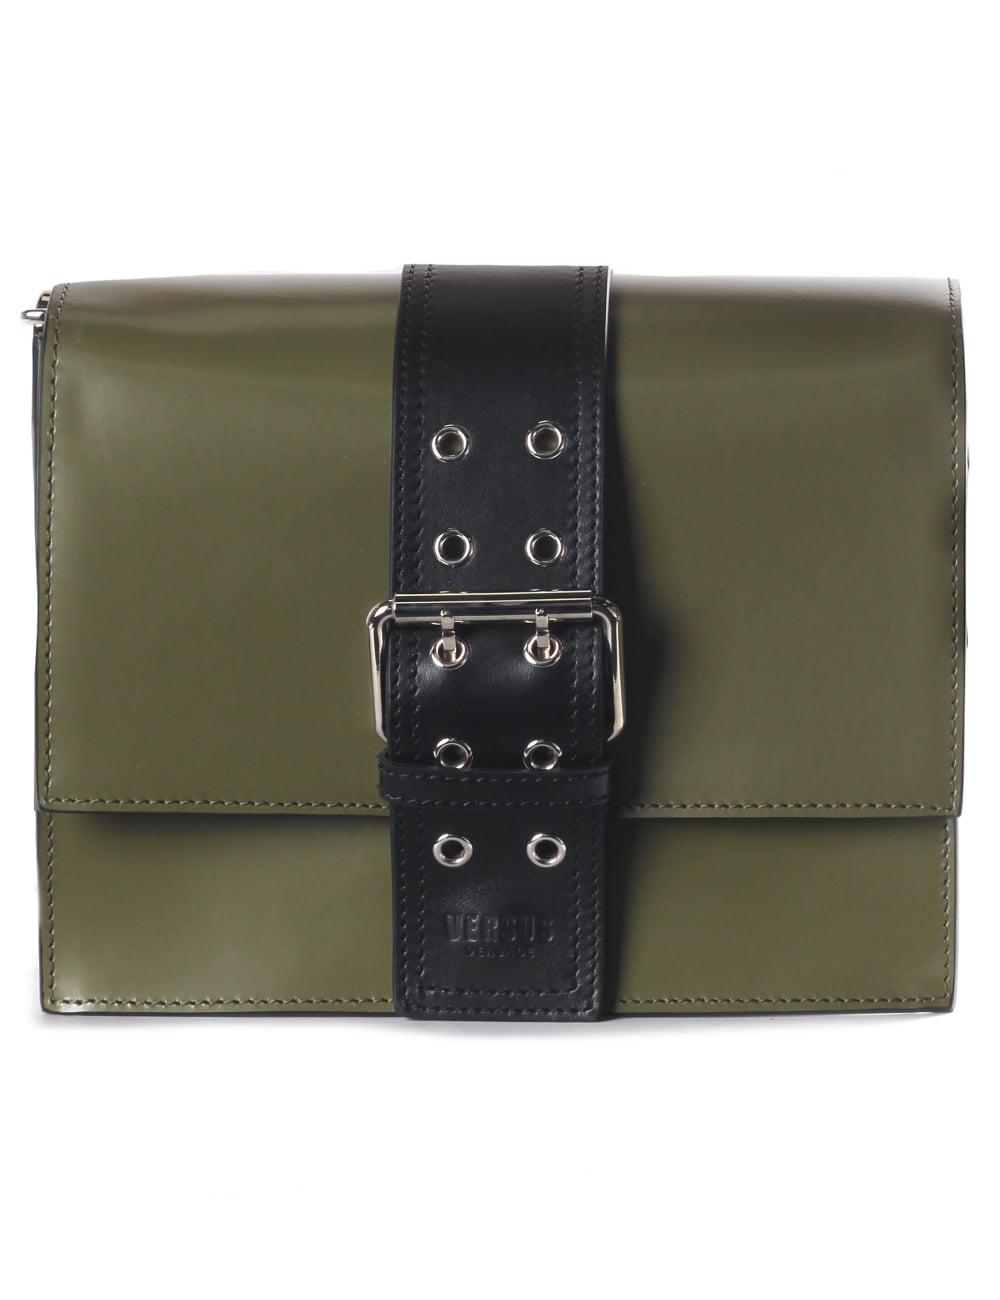 352b471fe5 Versus Versace Buckled Women s Shoulder Bag Military Green Black